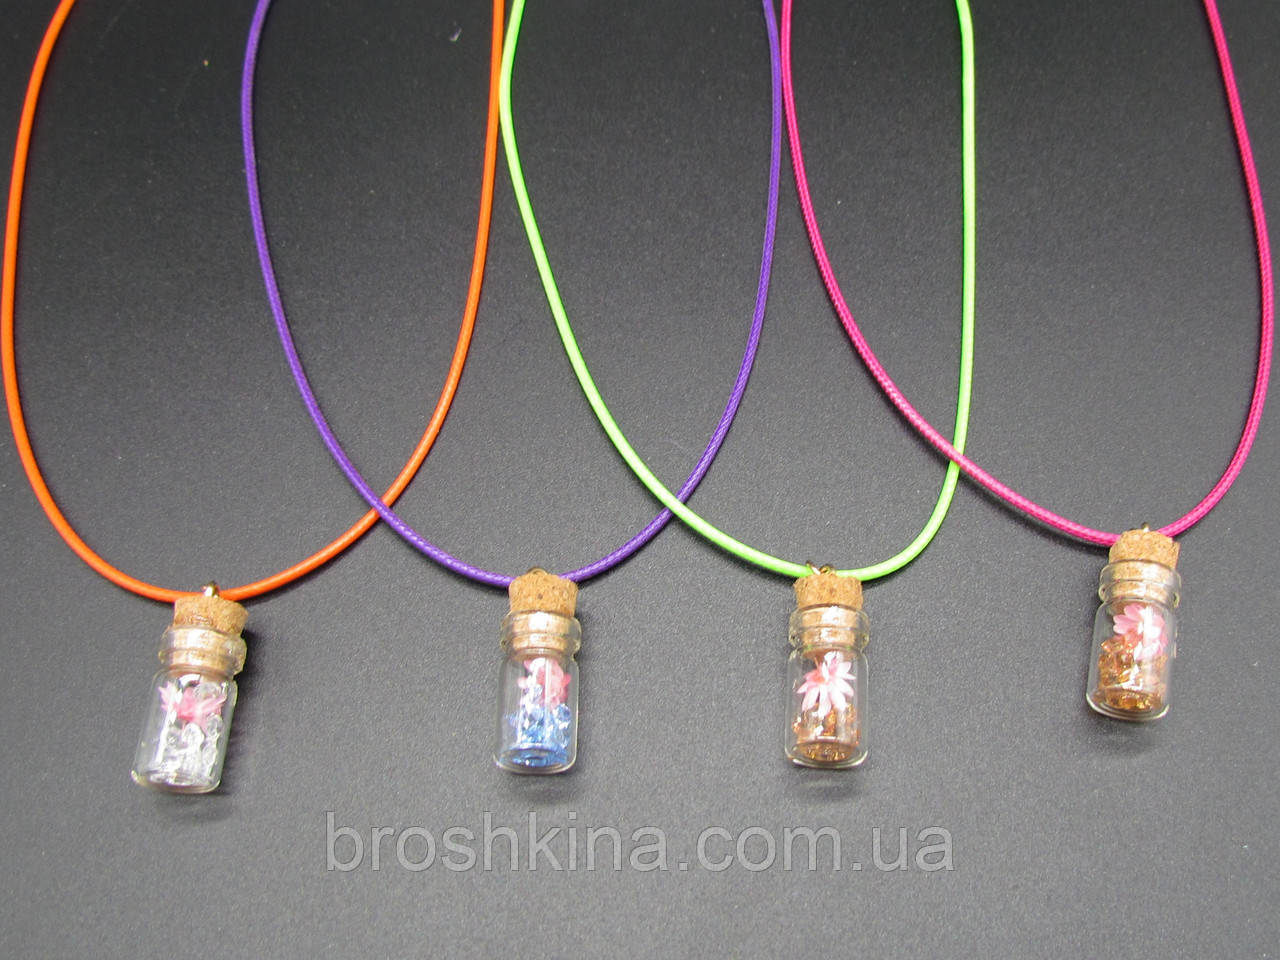 Кулоны Бутылочка желаний цветные 4 шт/уп.